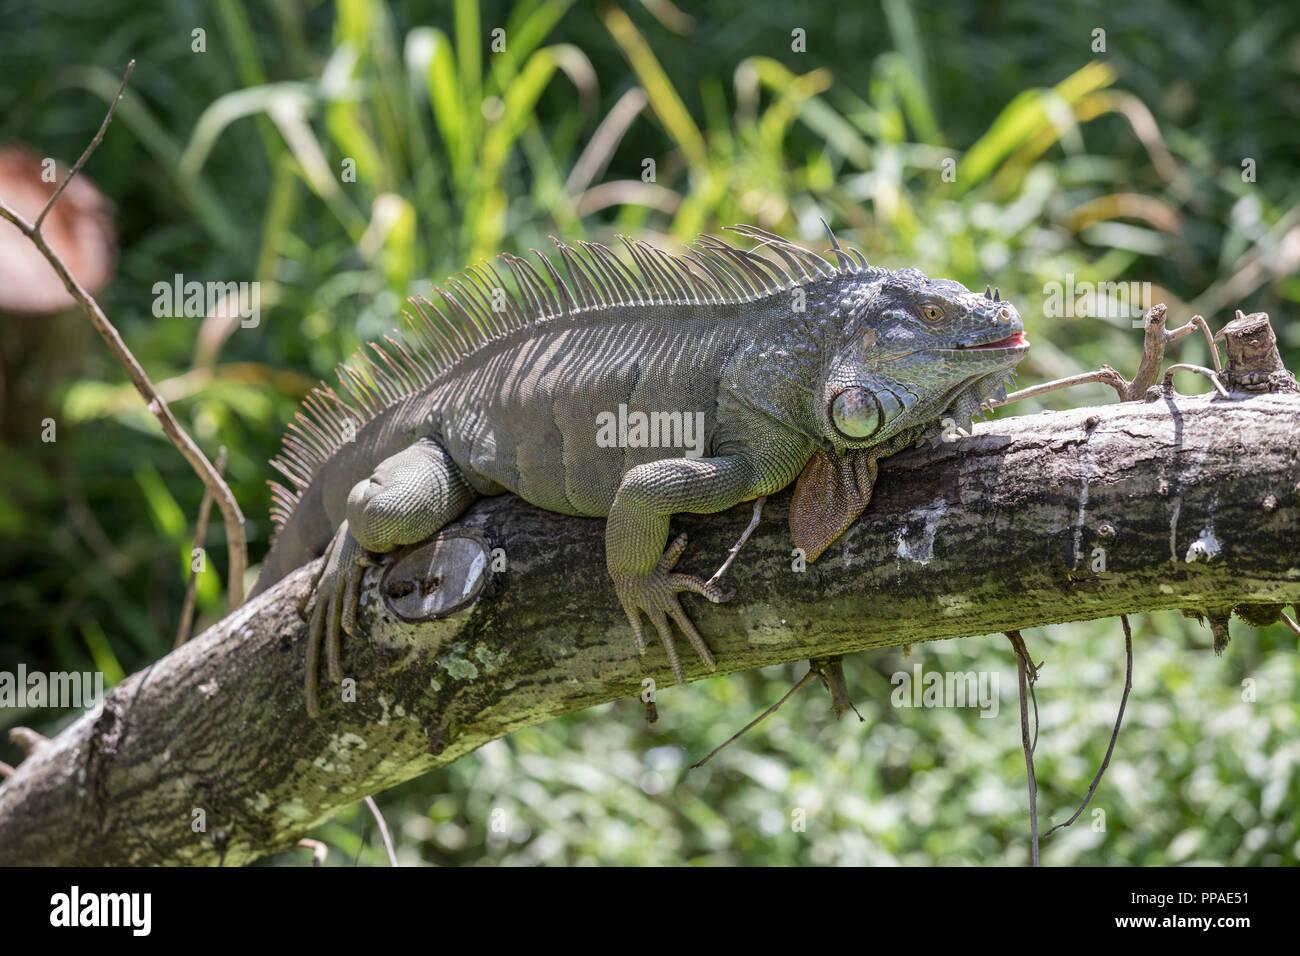 SGP, Singapur, 20.02.2017, Singapur Jurong Bird Park Grüner Leguan Iguana iguana © 2017 Christoph Hermann - Stock Image